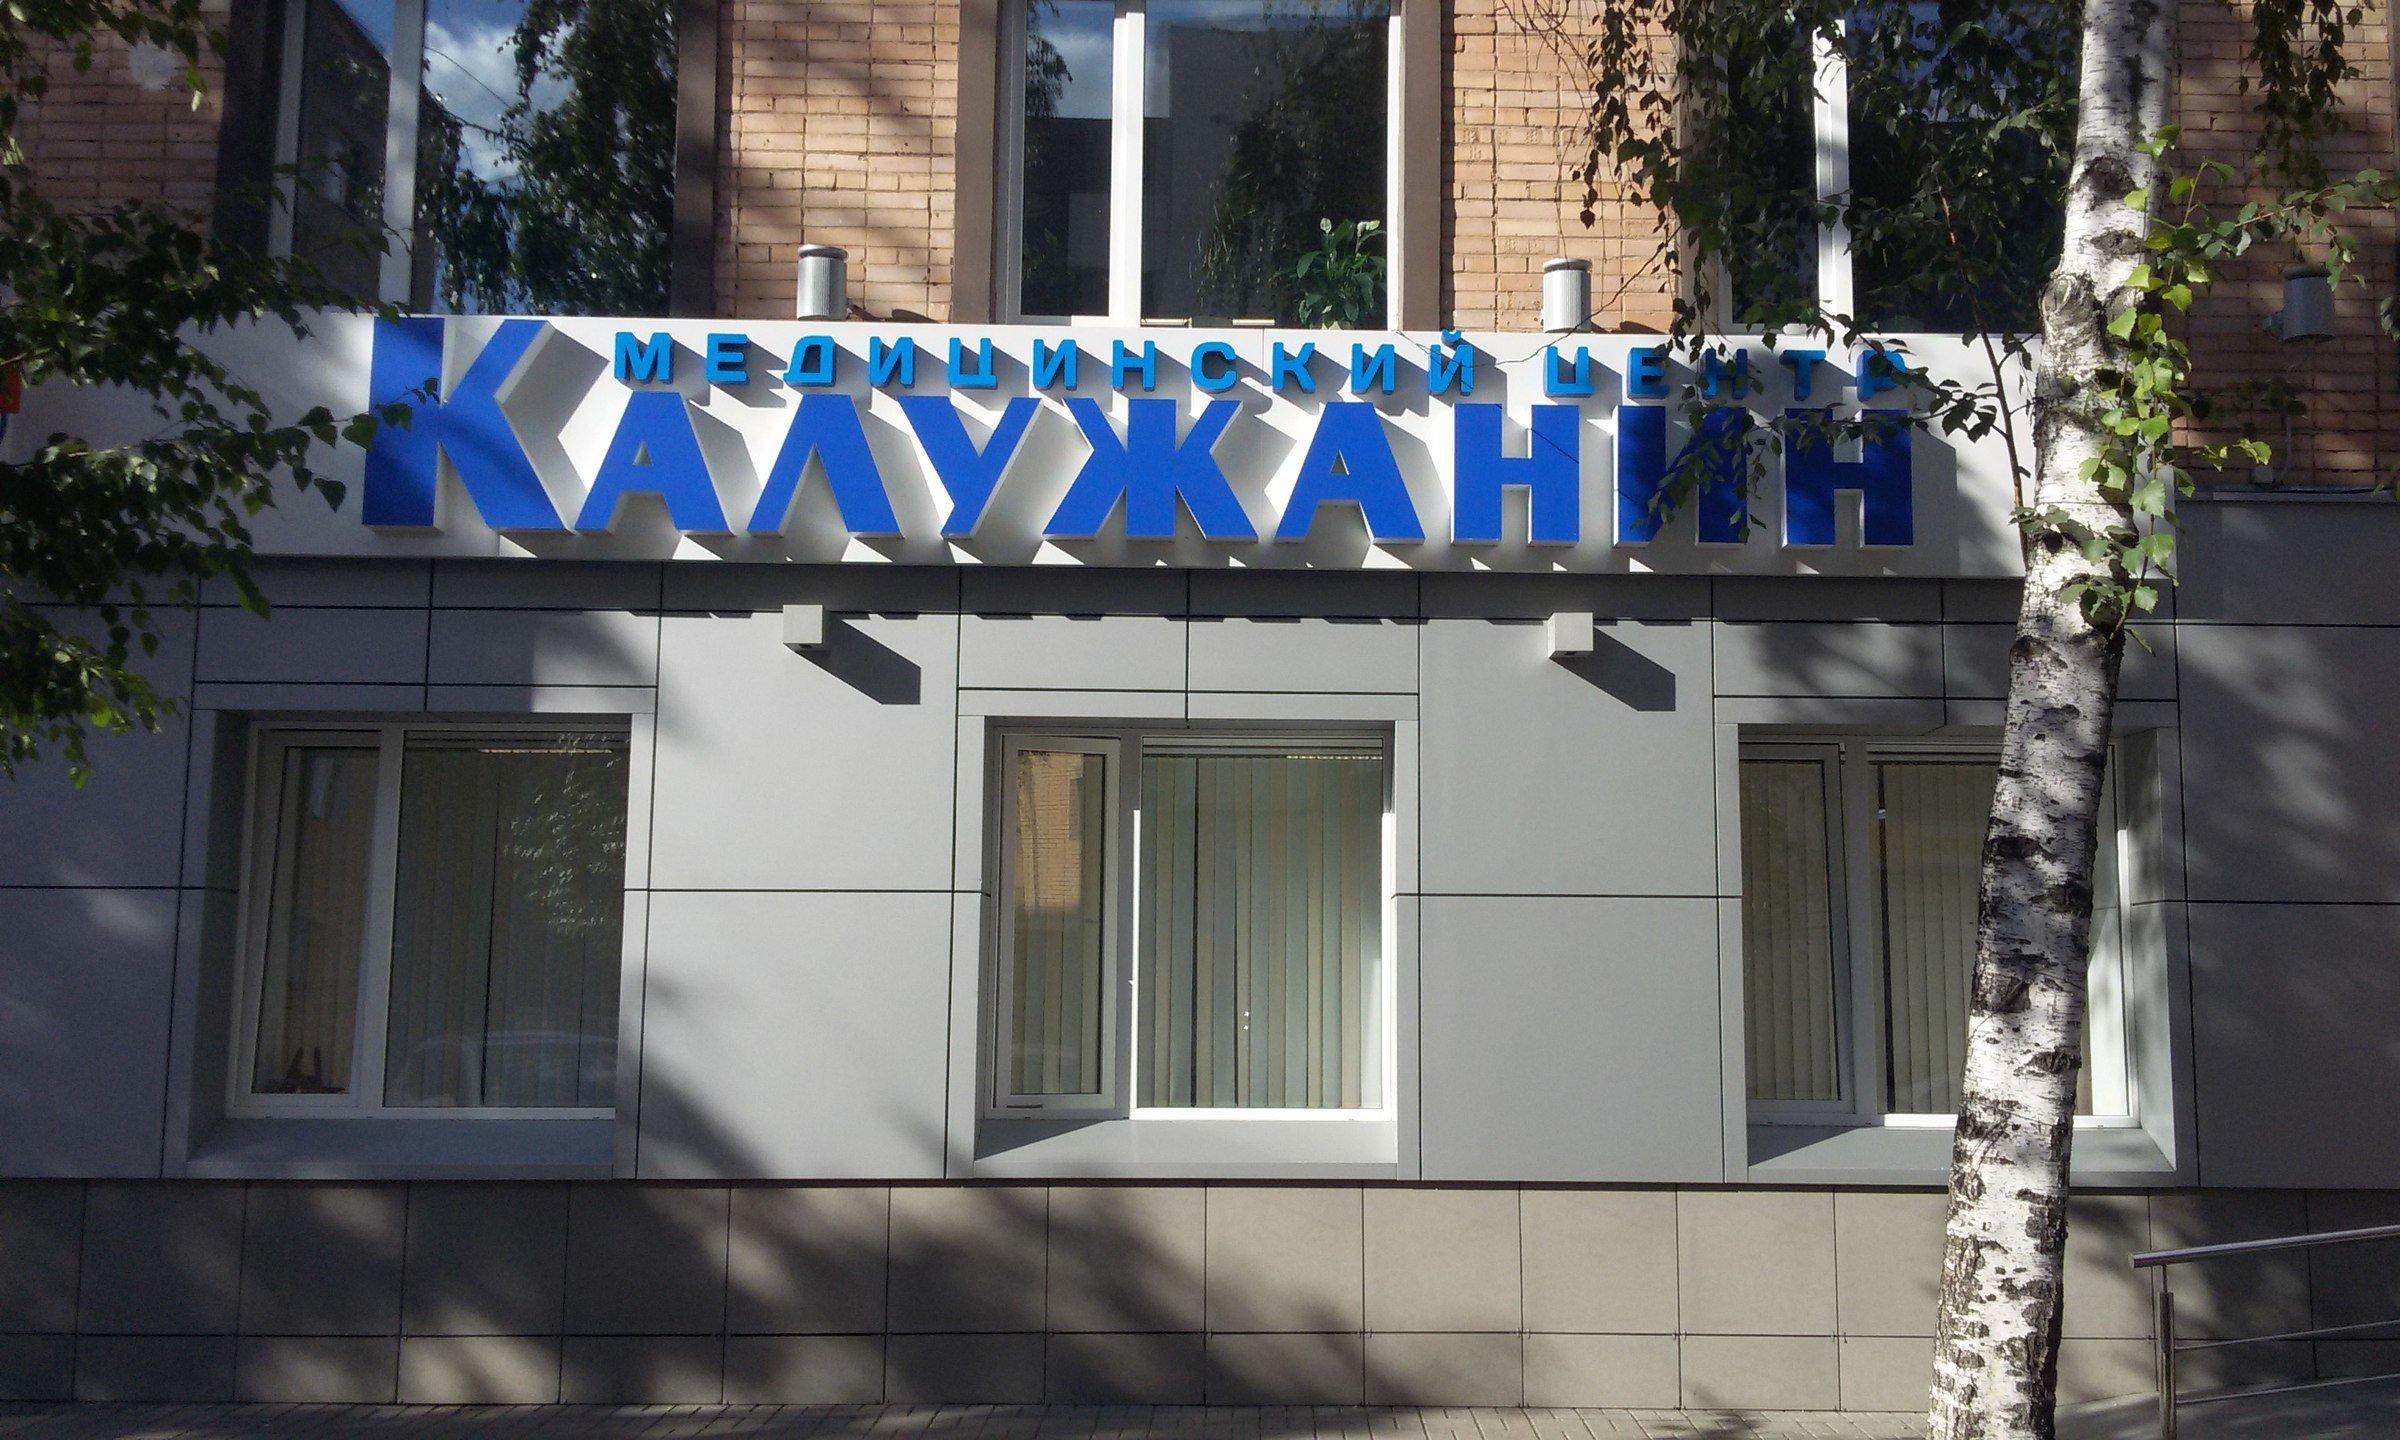 фотография Медицинского центра Калужанин на улице Суворова